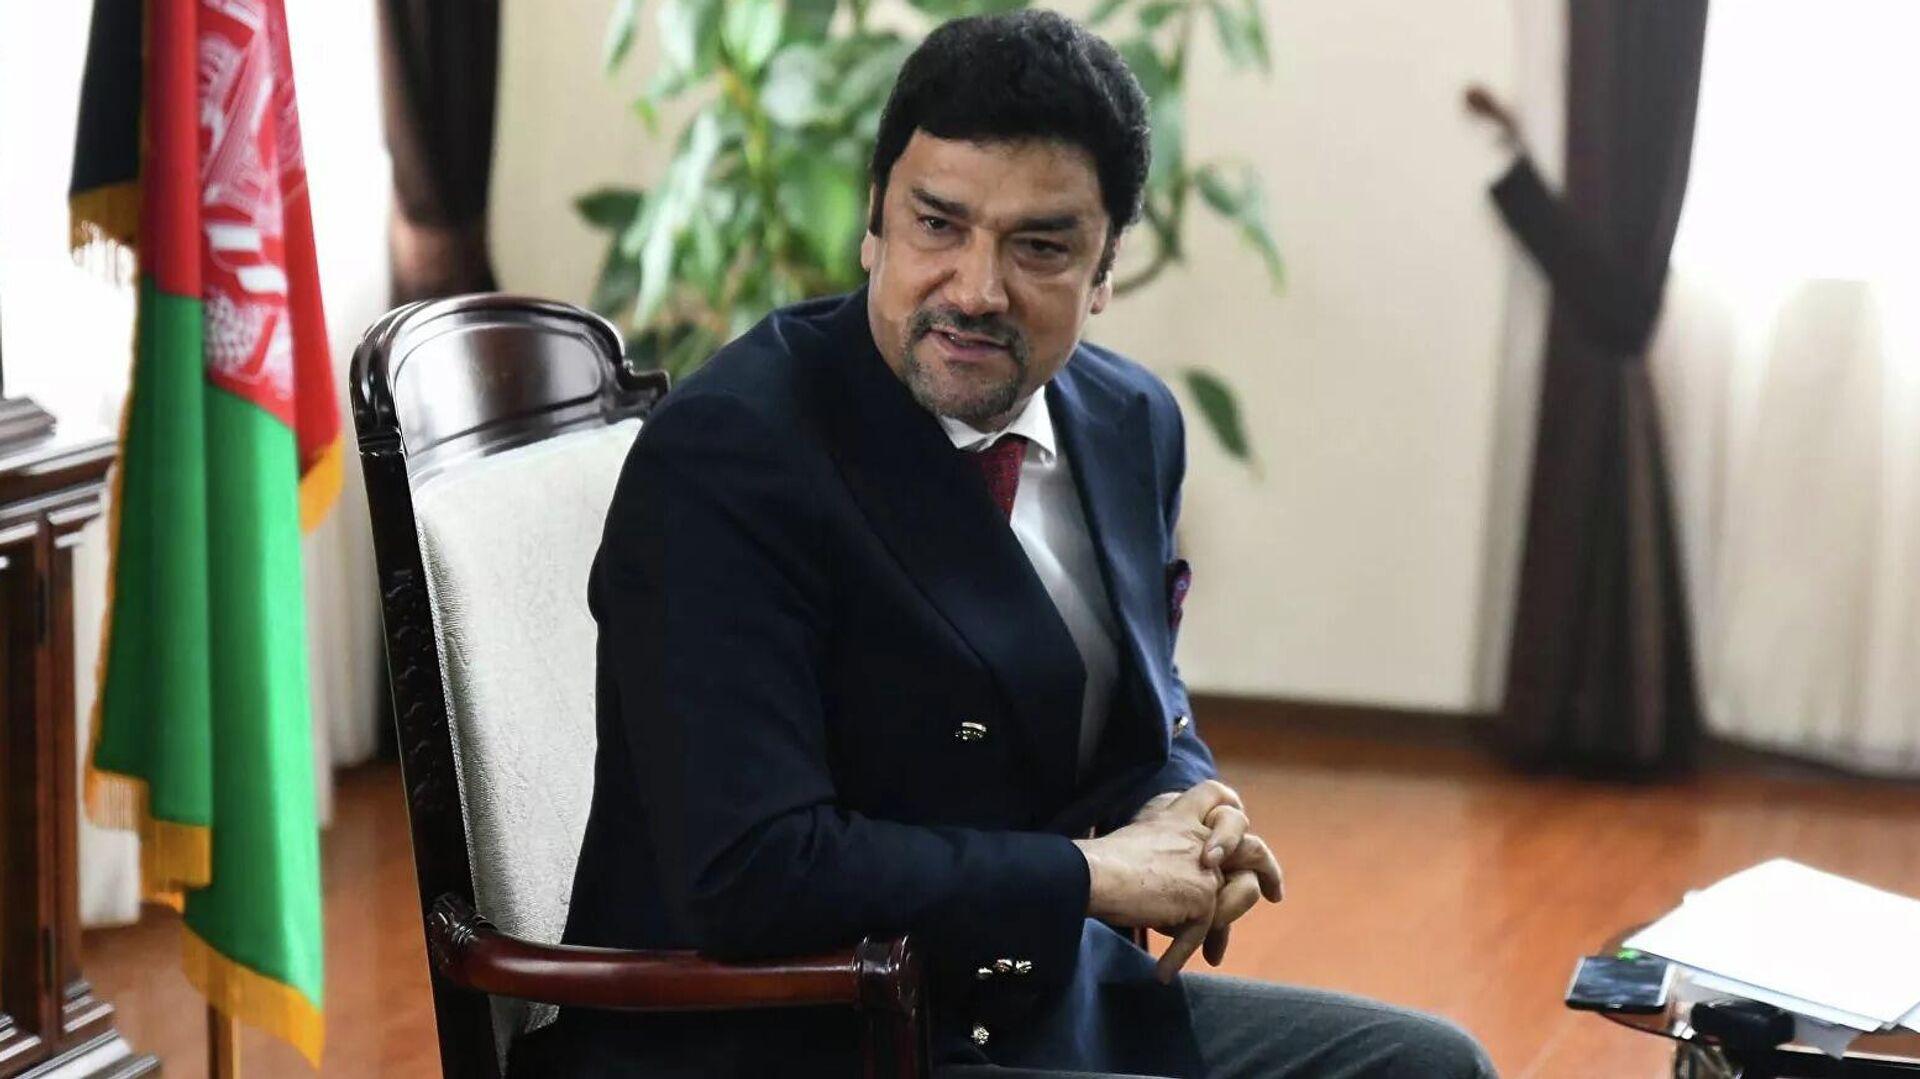 Посол Афганистана в Таджикистане Мухаммад Зохир Агбар. - Sputnik Ўзбекистон, 1920, 01.09.2021